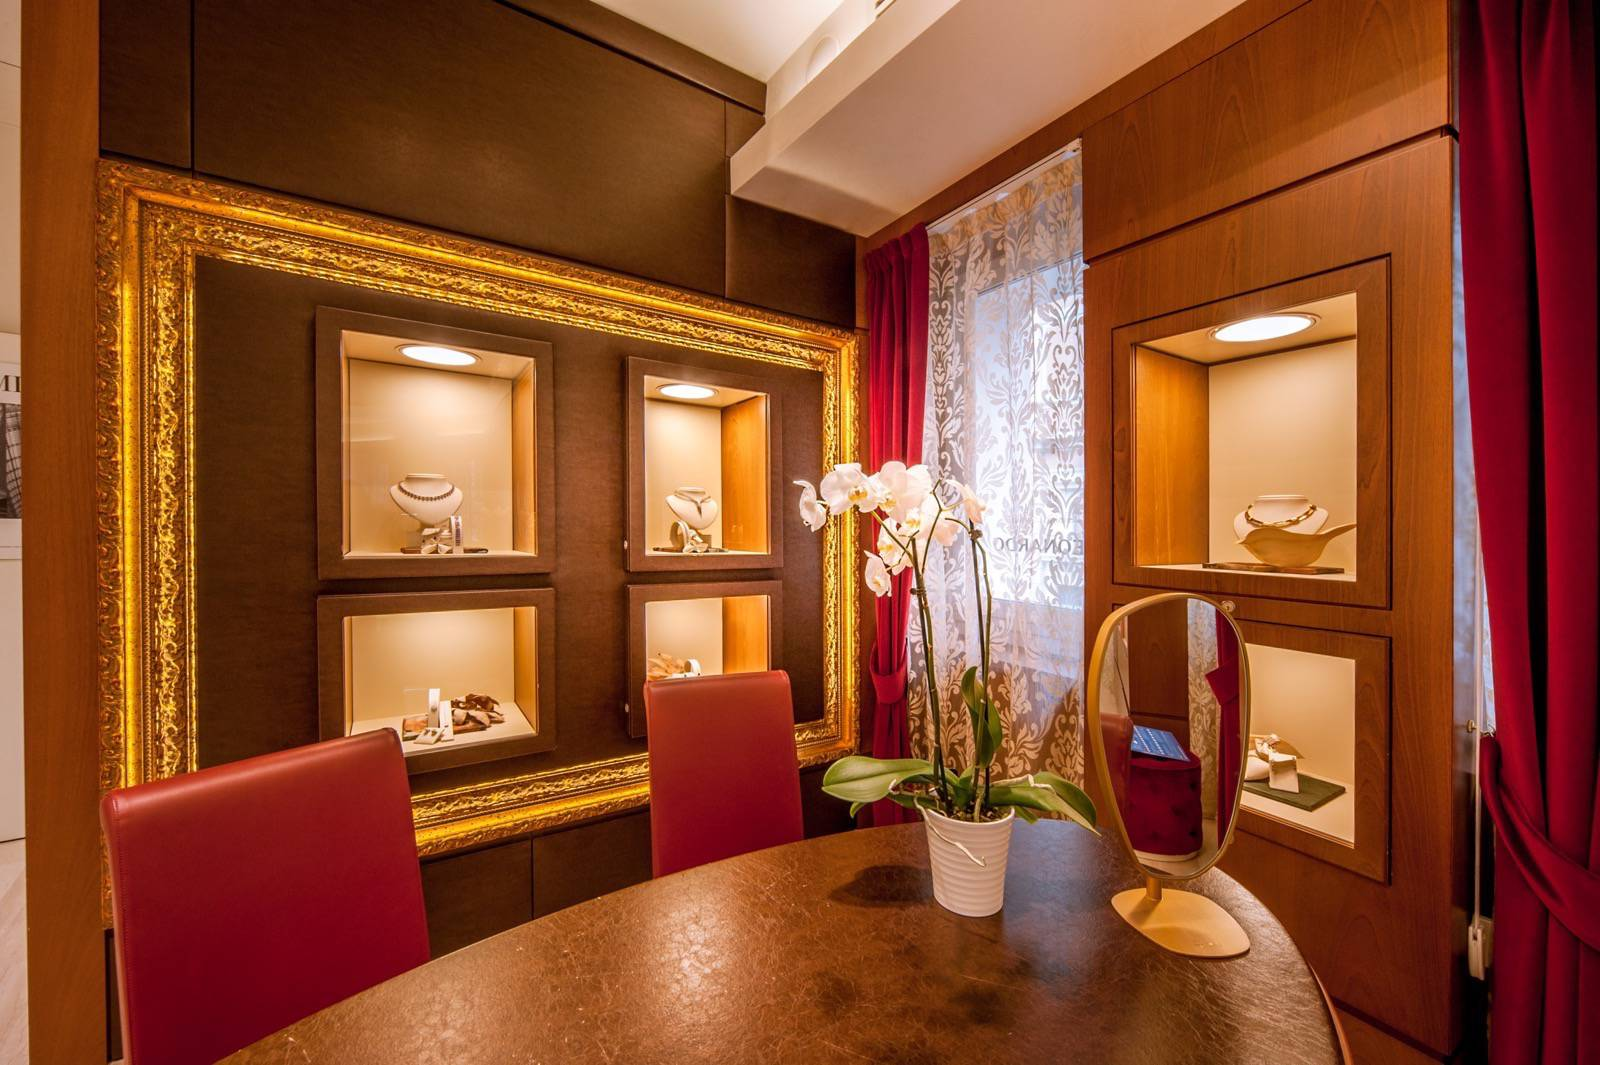 gioielli-leonardo-gioielleria-mestre-venezia-20